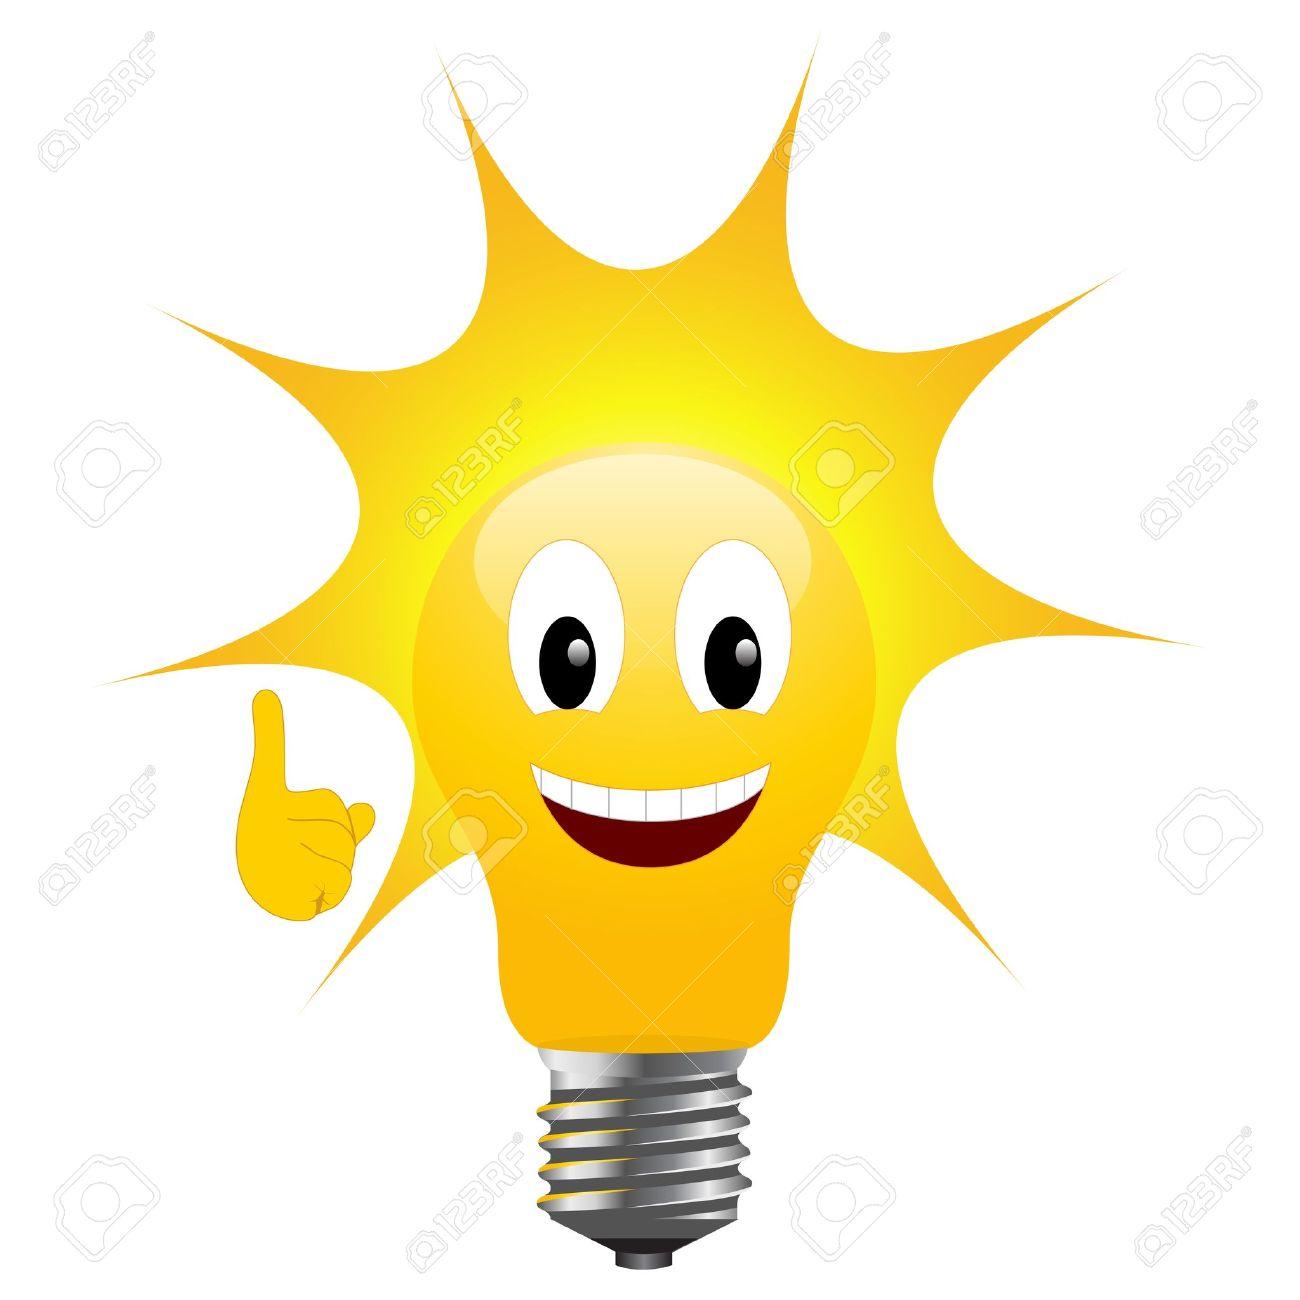 Light bulb with sun signifying solar energy Stock Vector - 9189540